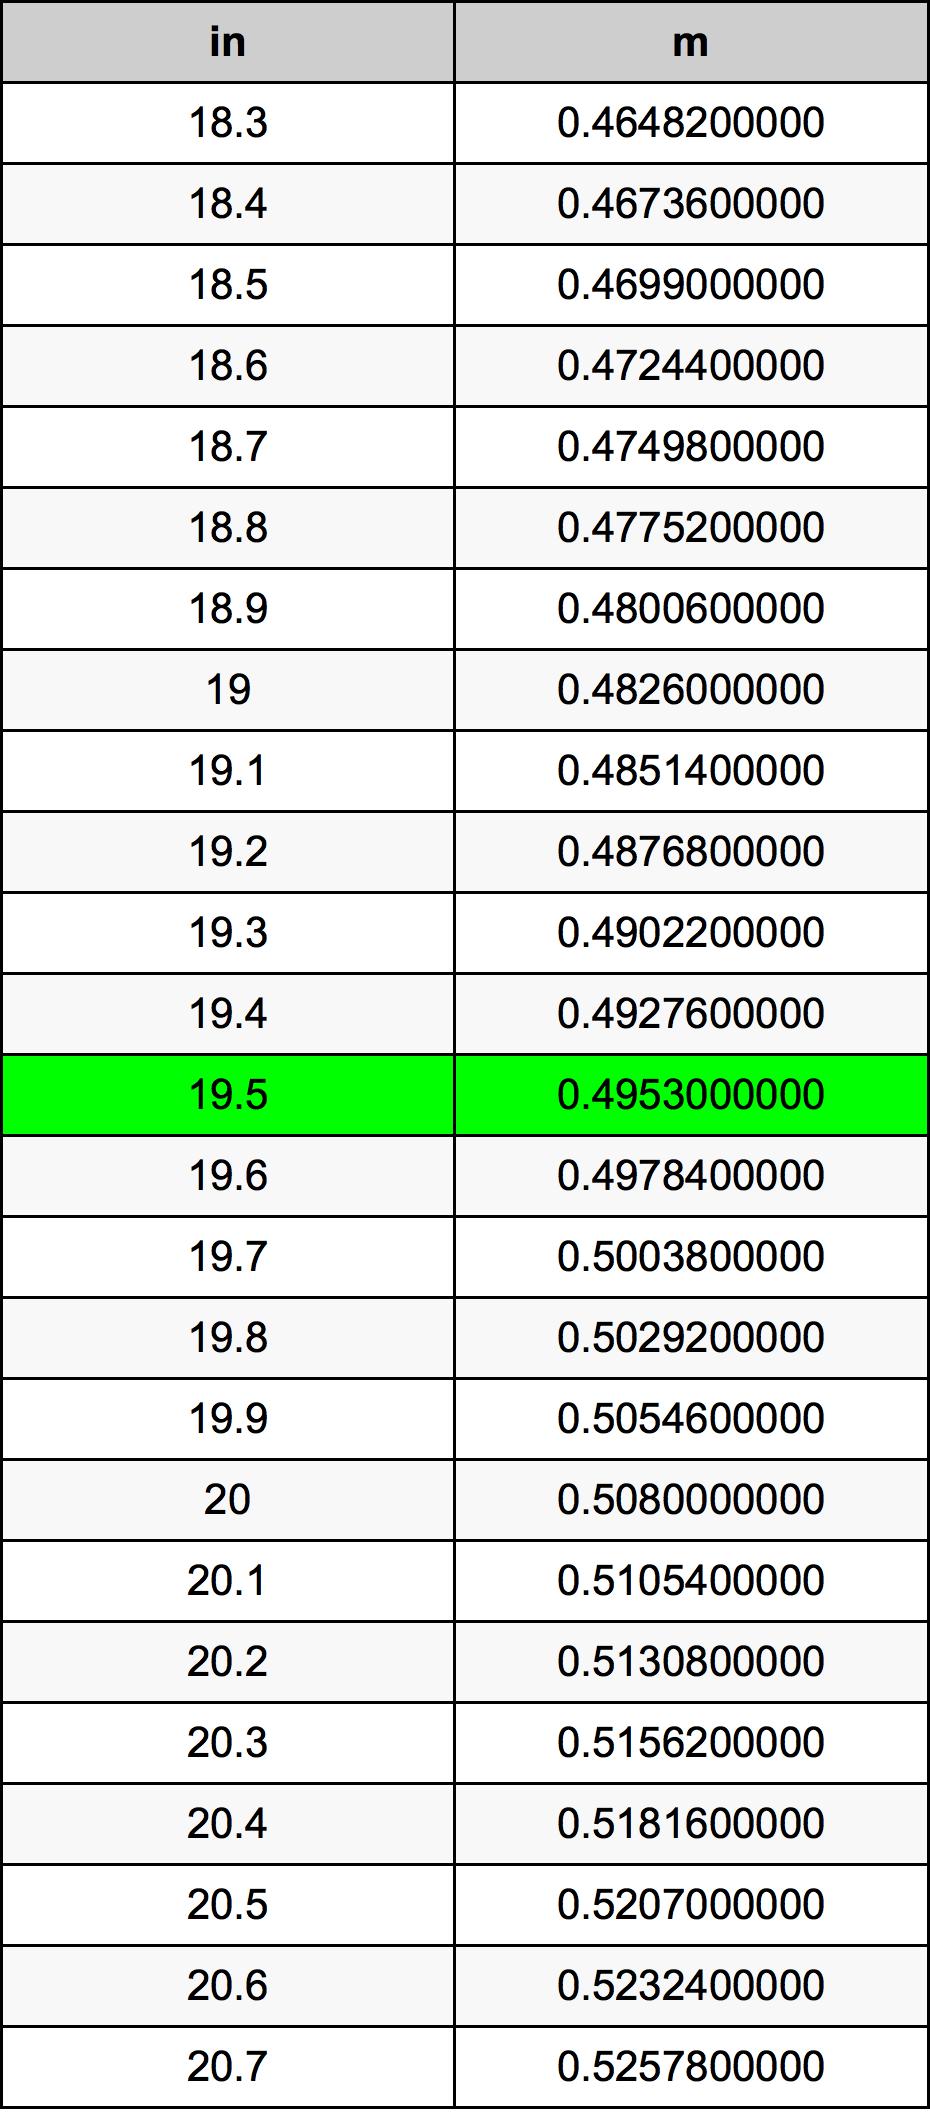 19.5 Inci konversi tabel